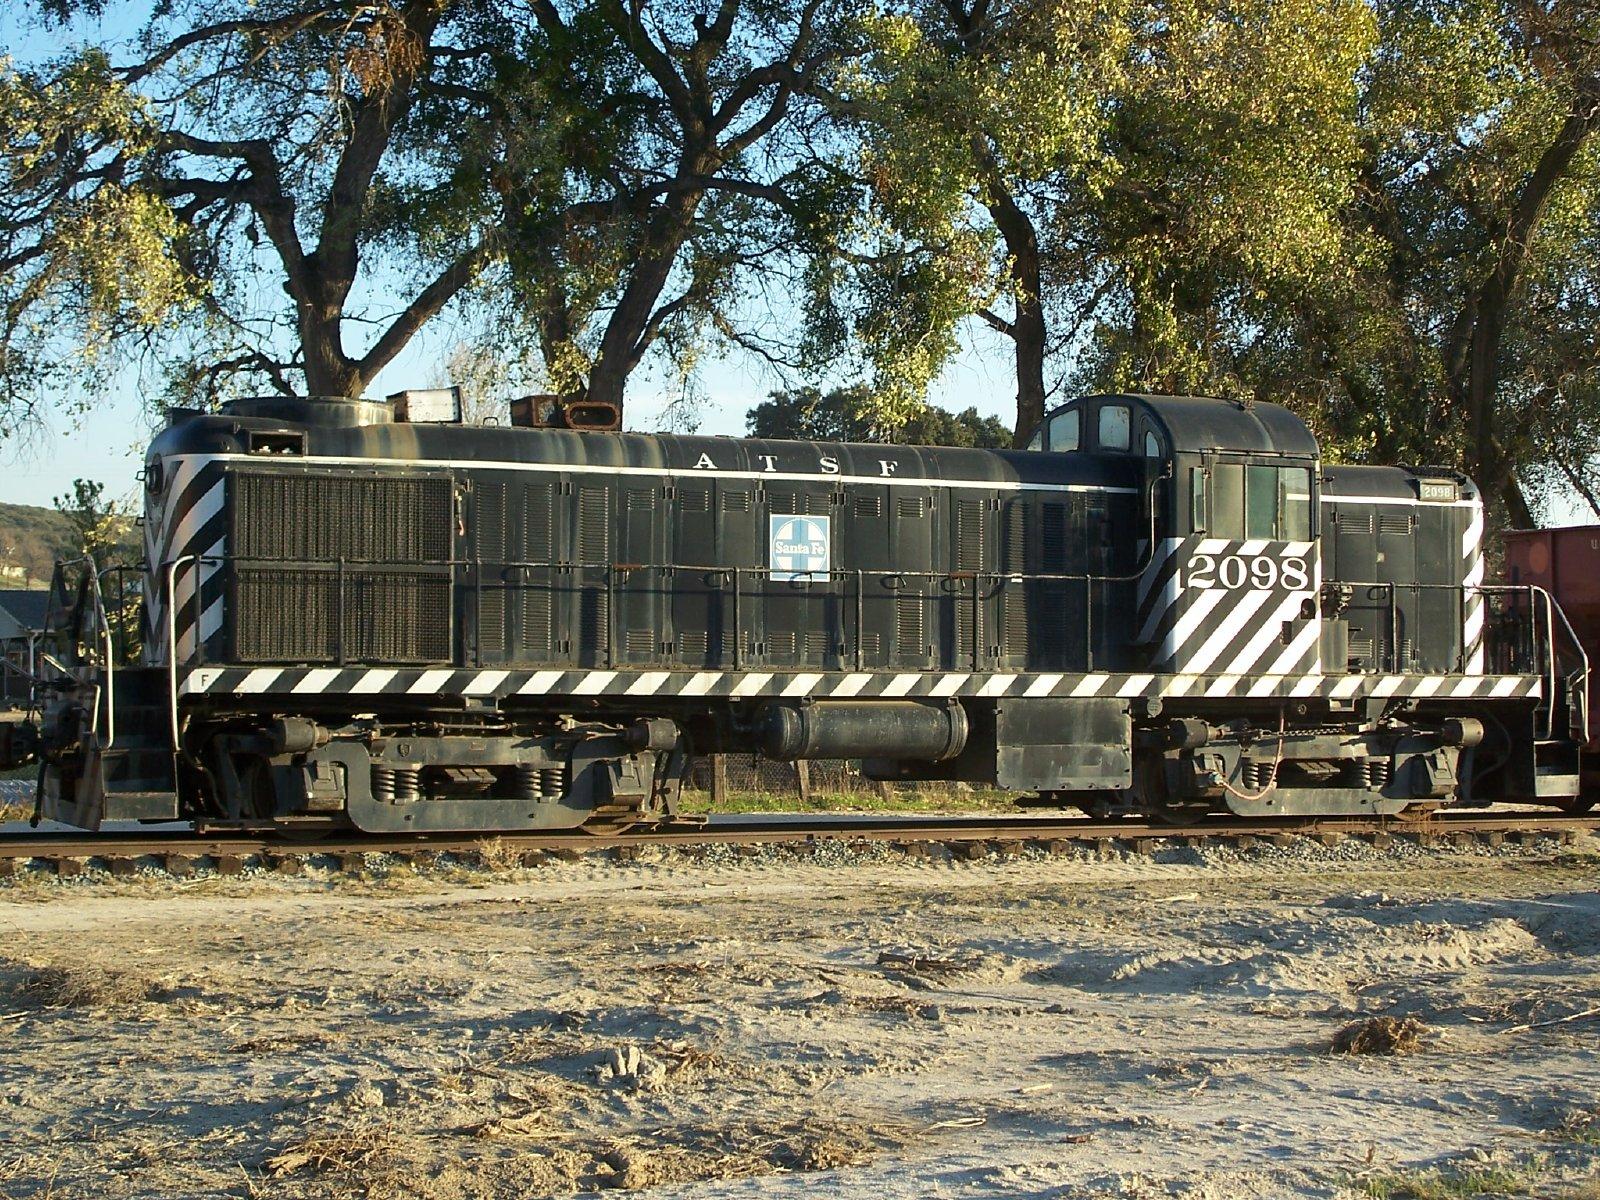 Atchison, Topeka & Santa Fe #2098